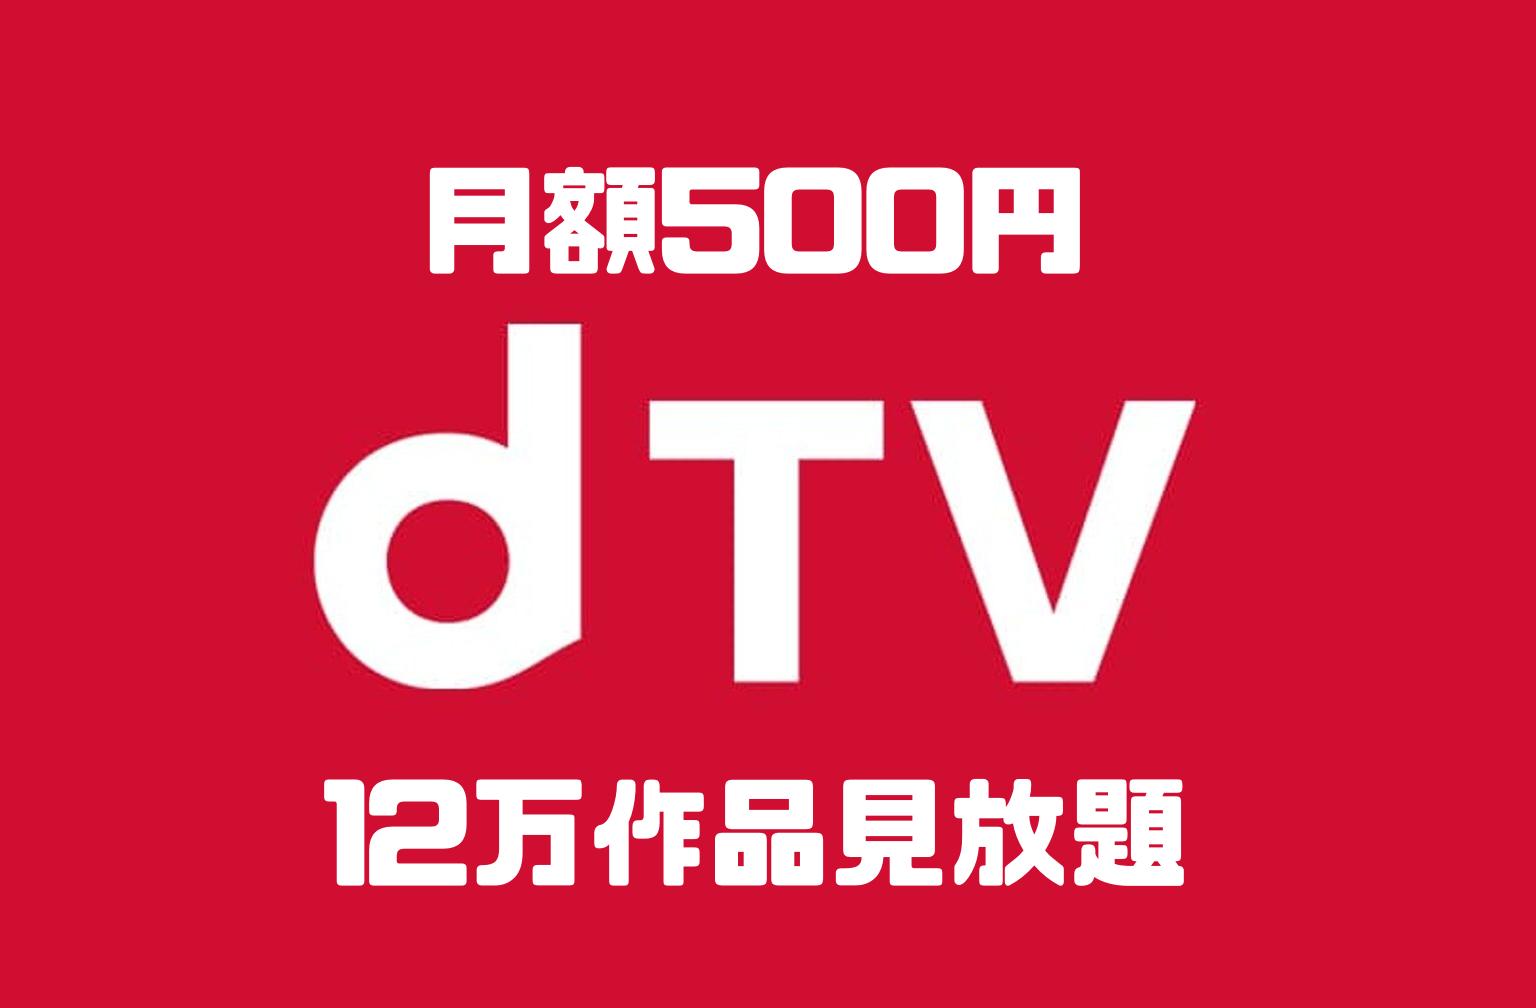 【dTV】月額500円で12万作品が見放題!